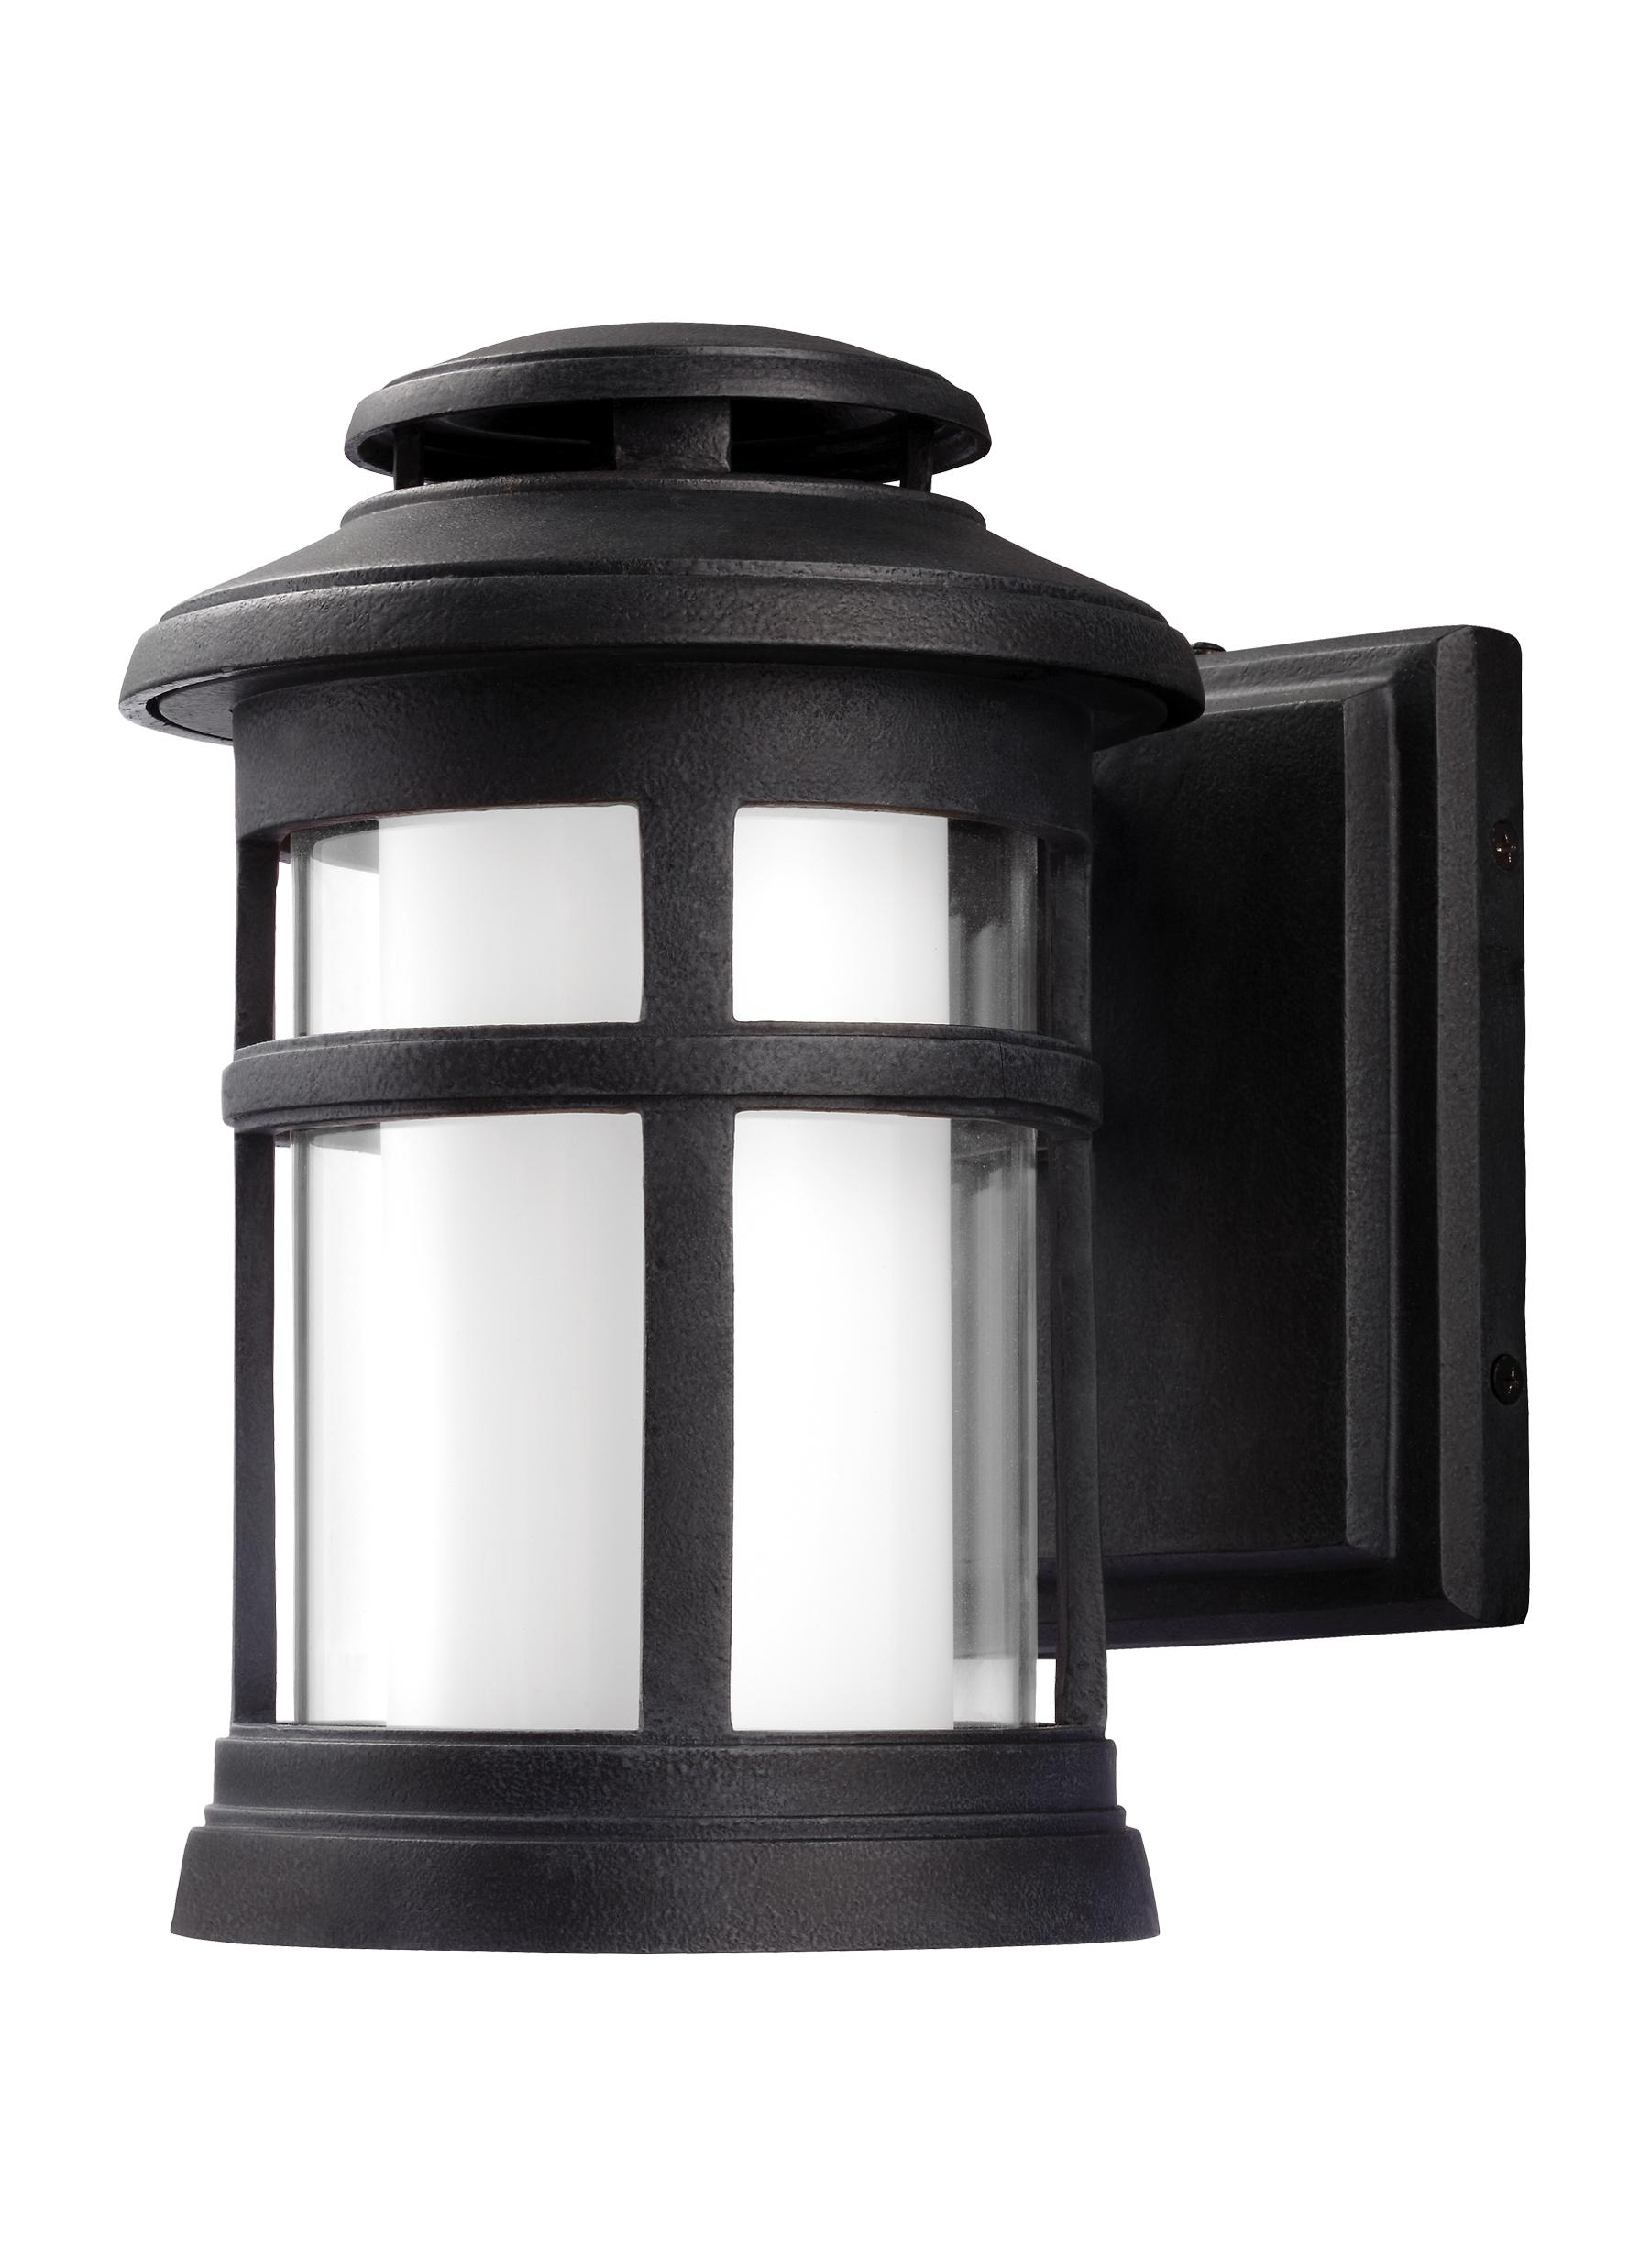 Newest Zinc Outdoor Lanterns For Ol12500Dwz Led,1 – Light Outdoor Wall Lantern,dark Weathered Zinc (Gallery 6 of 20)